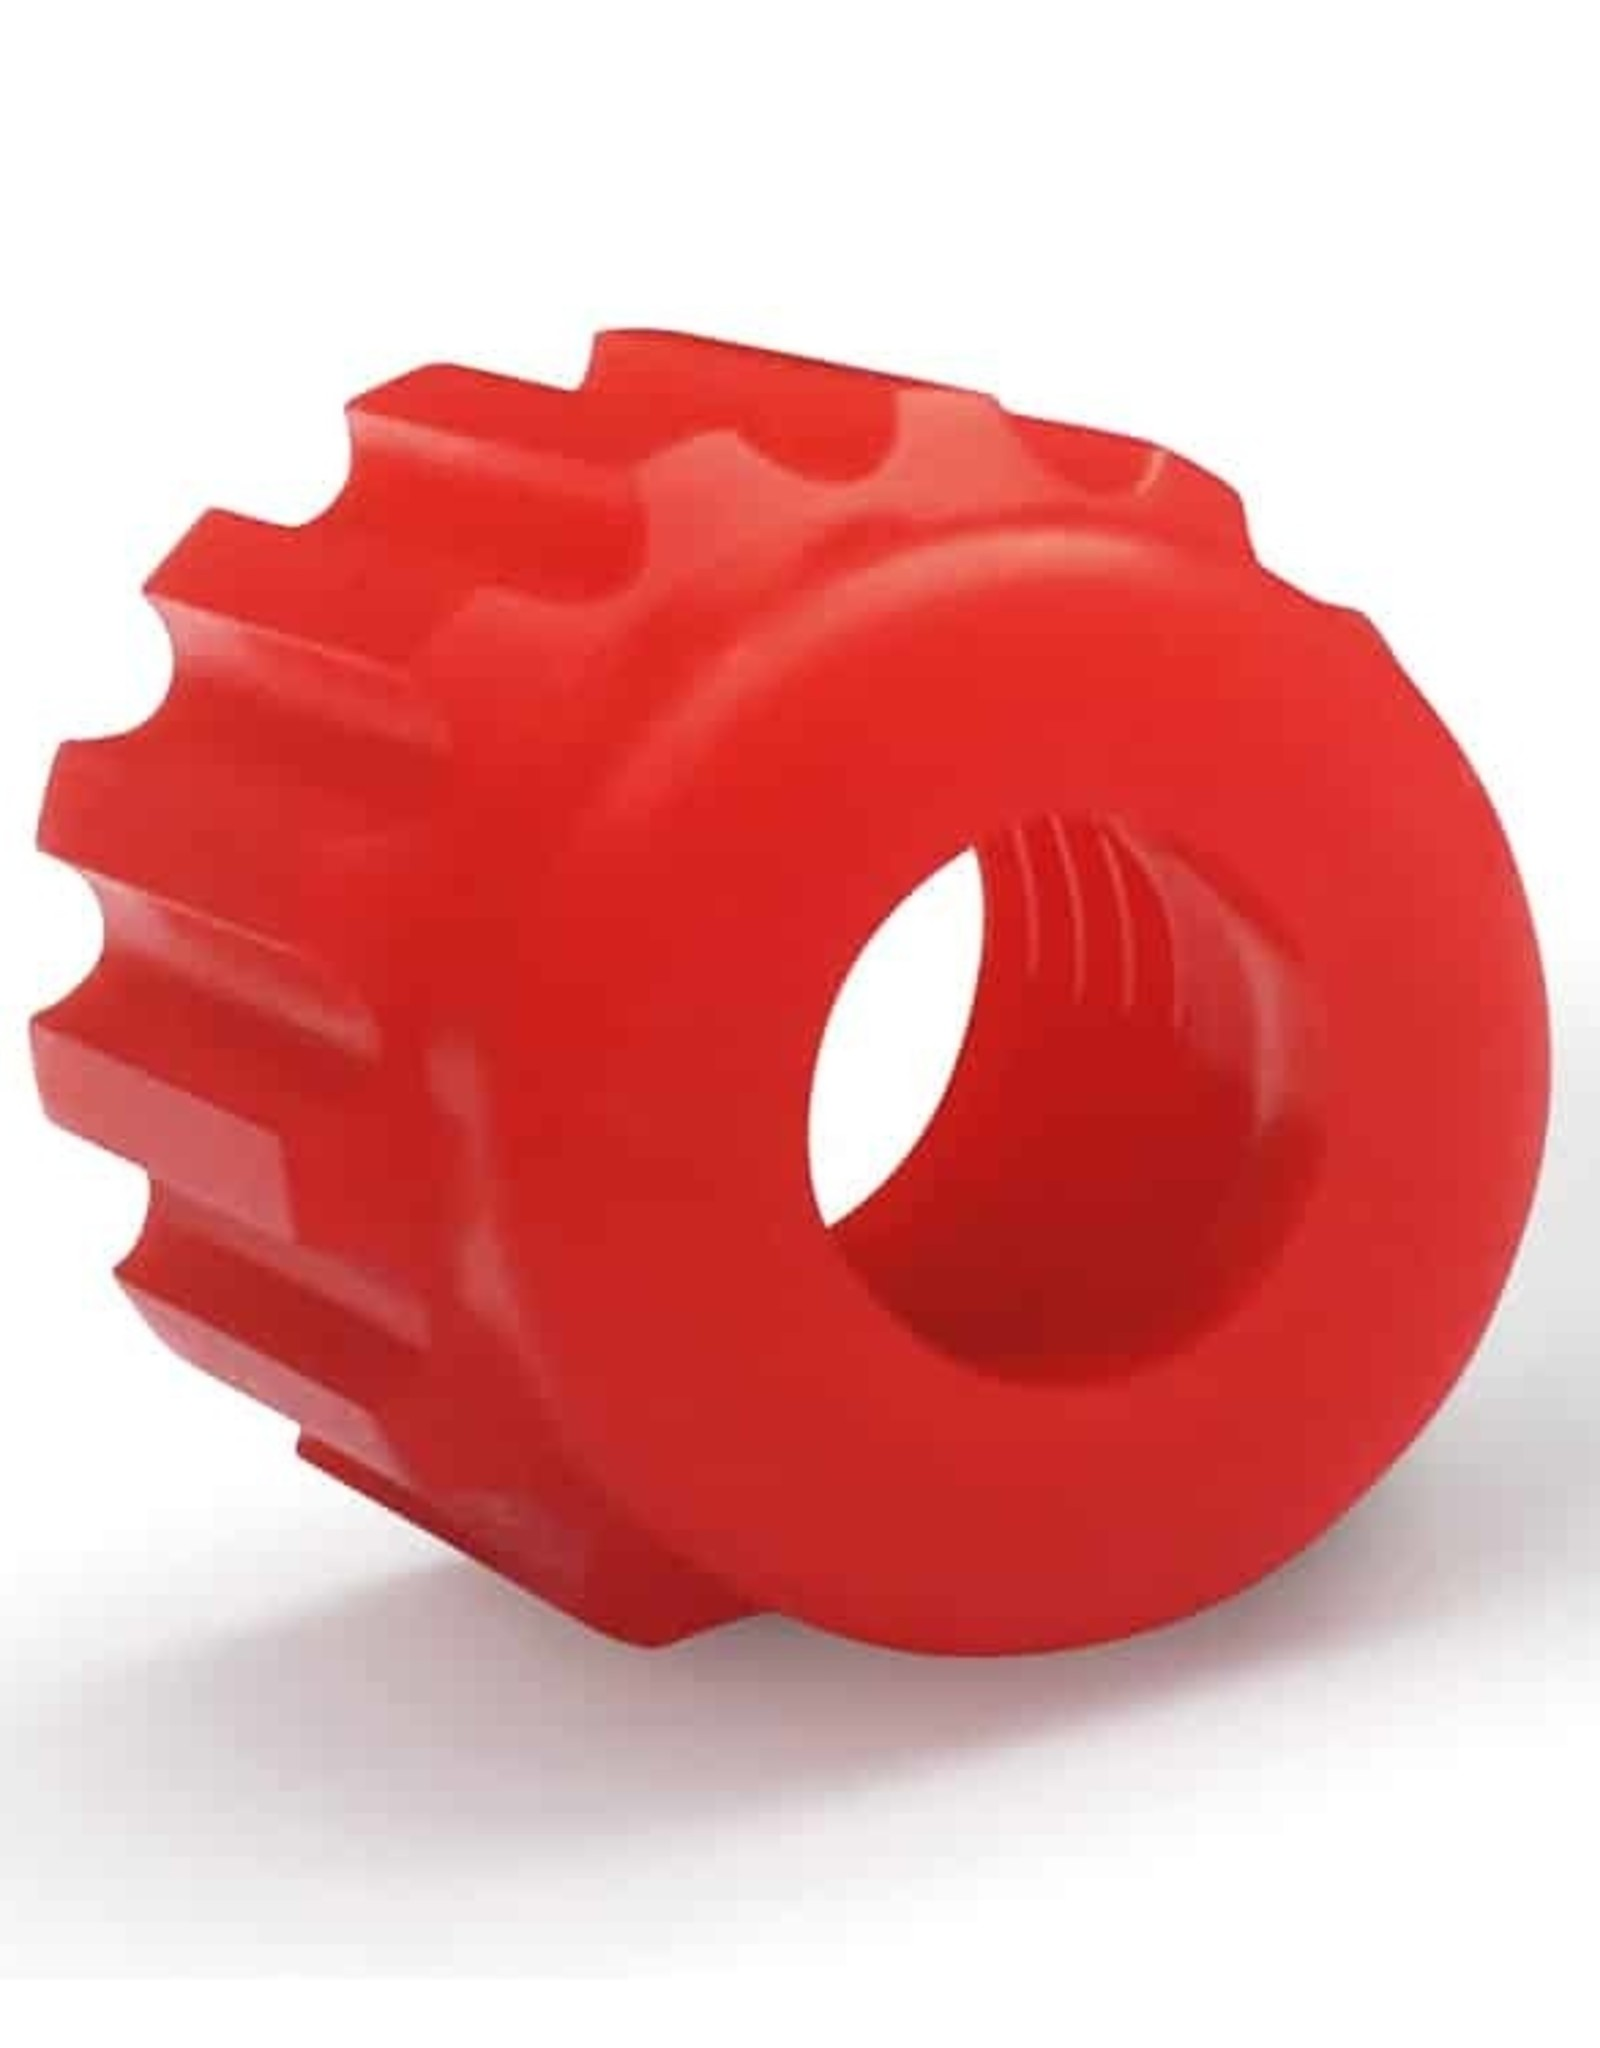 Autopot AquaValve Collar